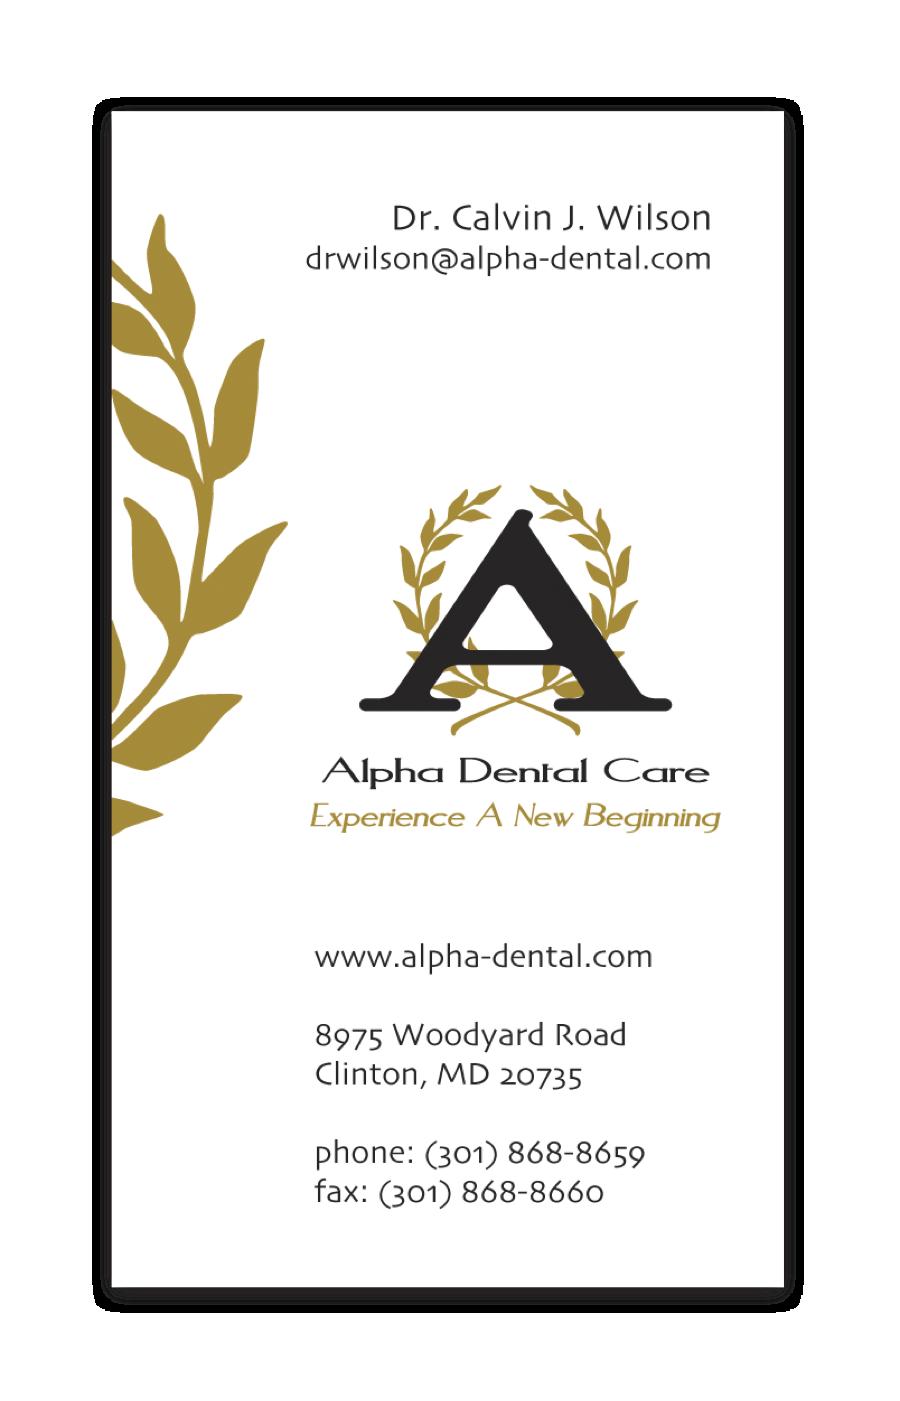 Alpha commercial business cards gallery business card template alpha dental care business card thumbnail for alpha dental care colourmoves colourmoves